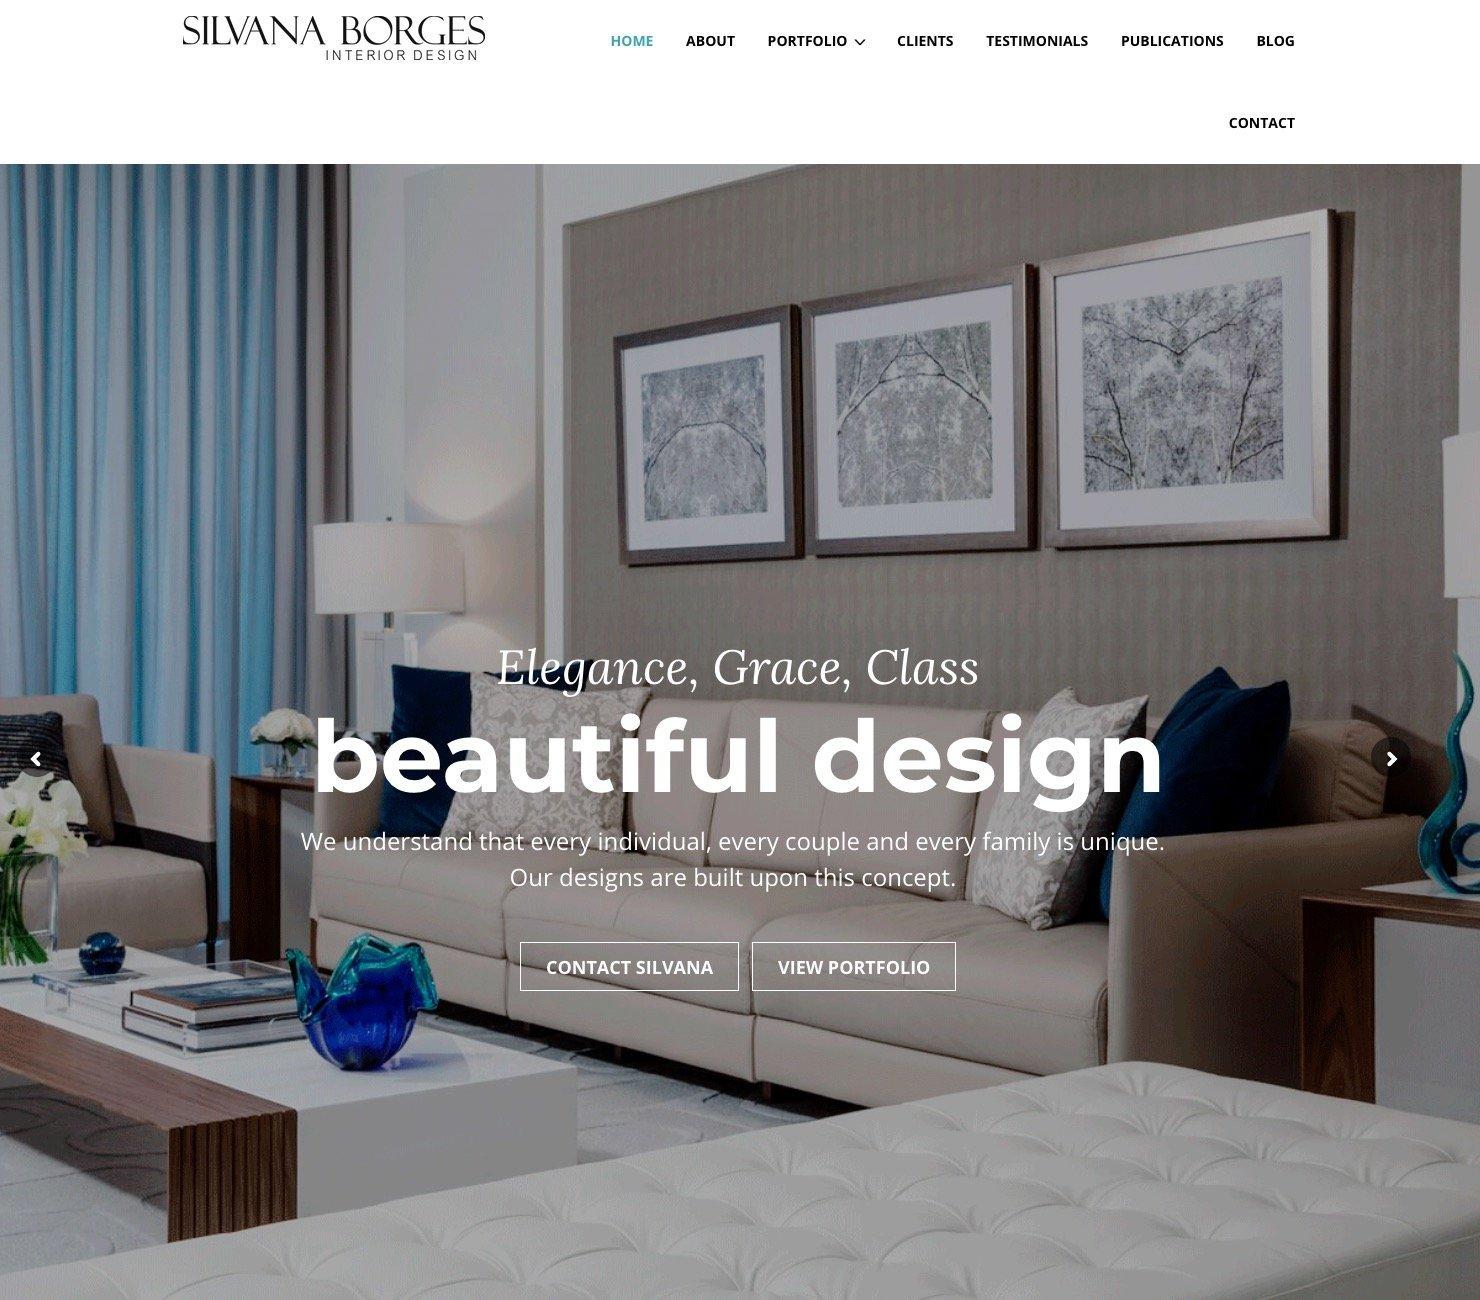 Silvana Borges Website